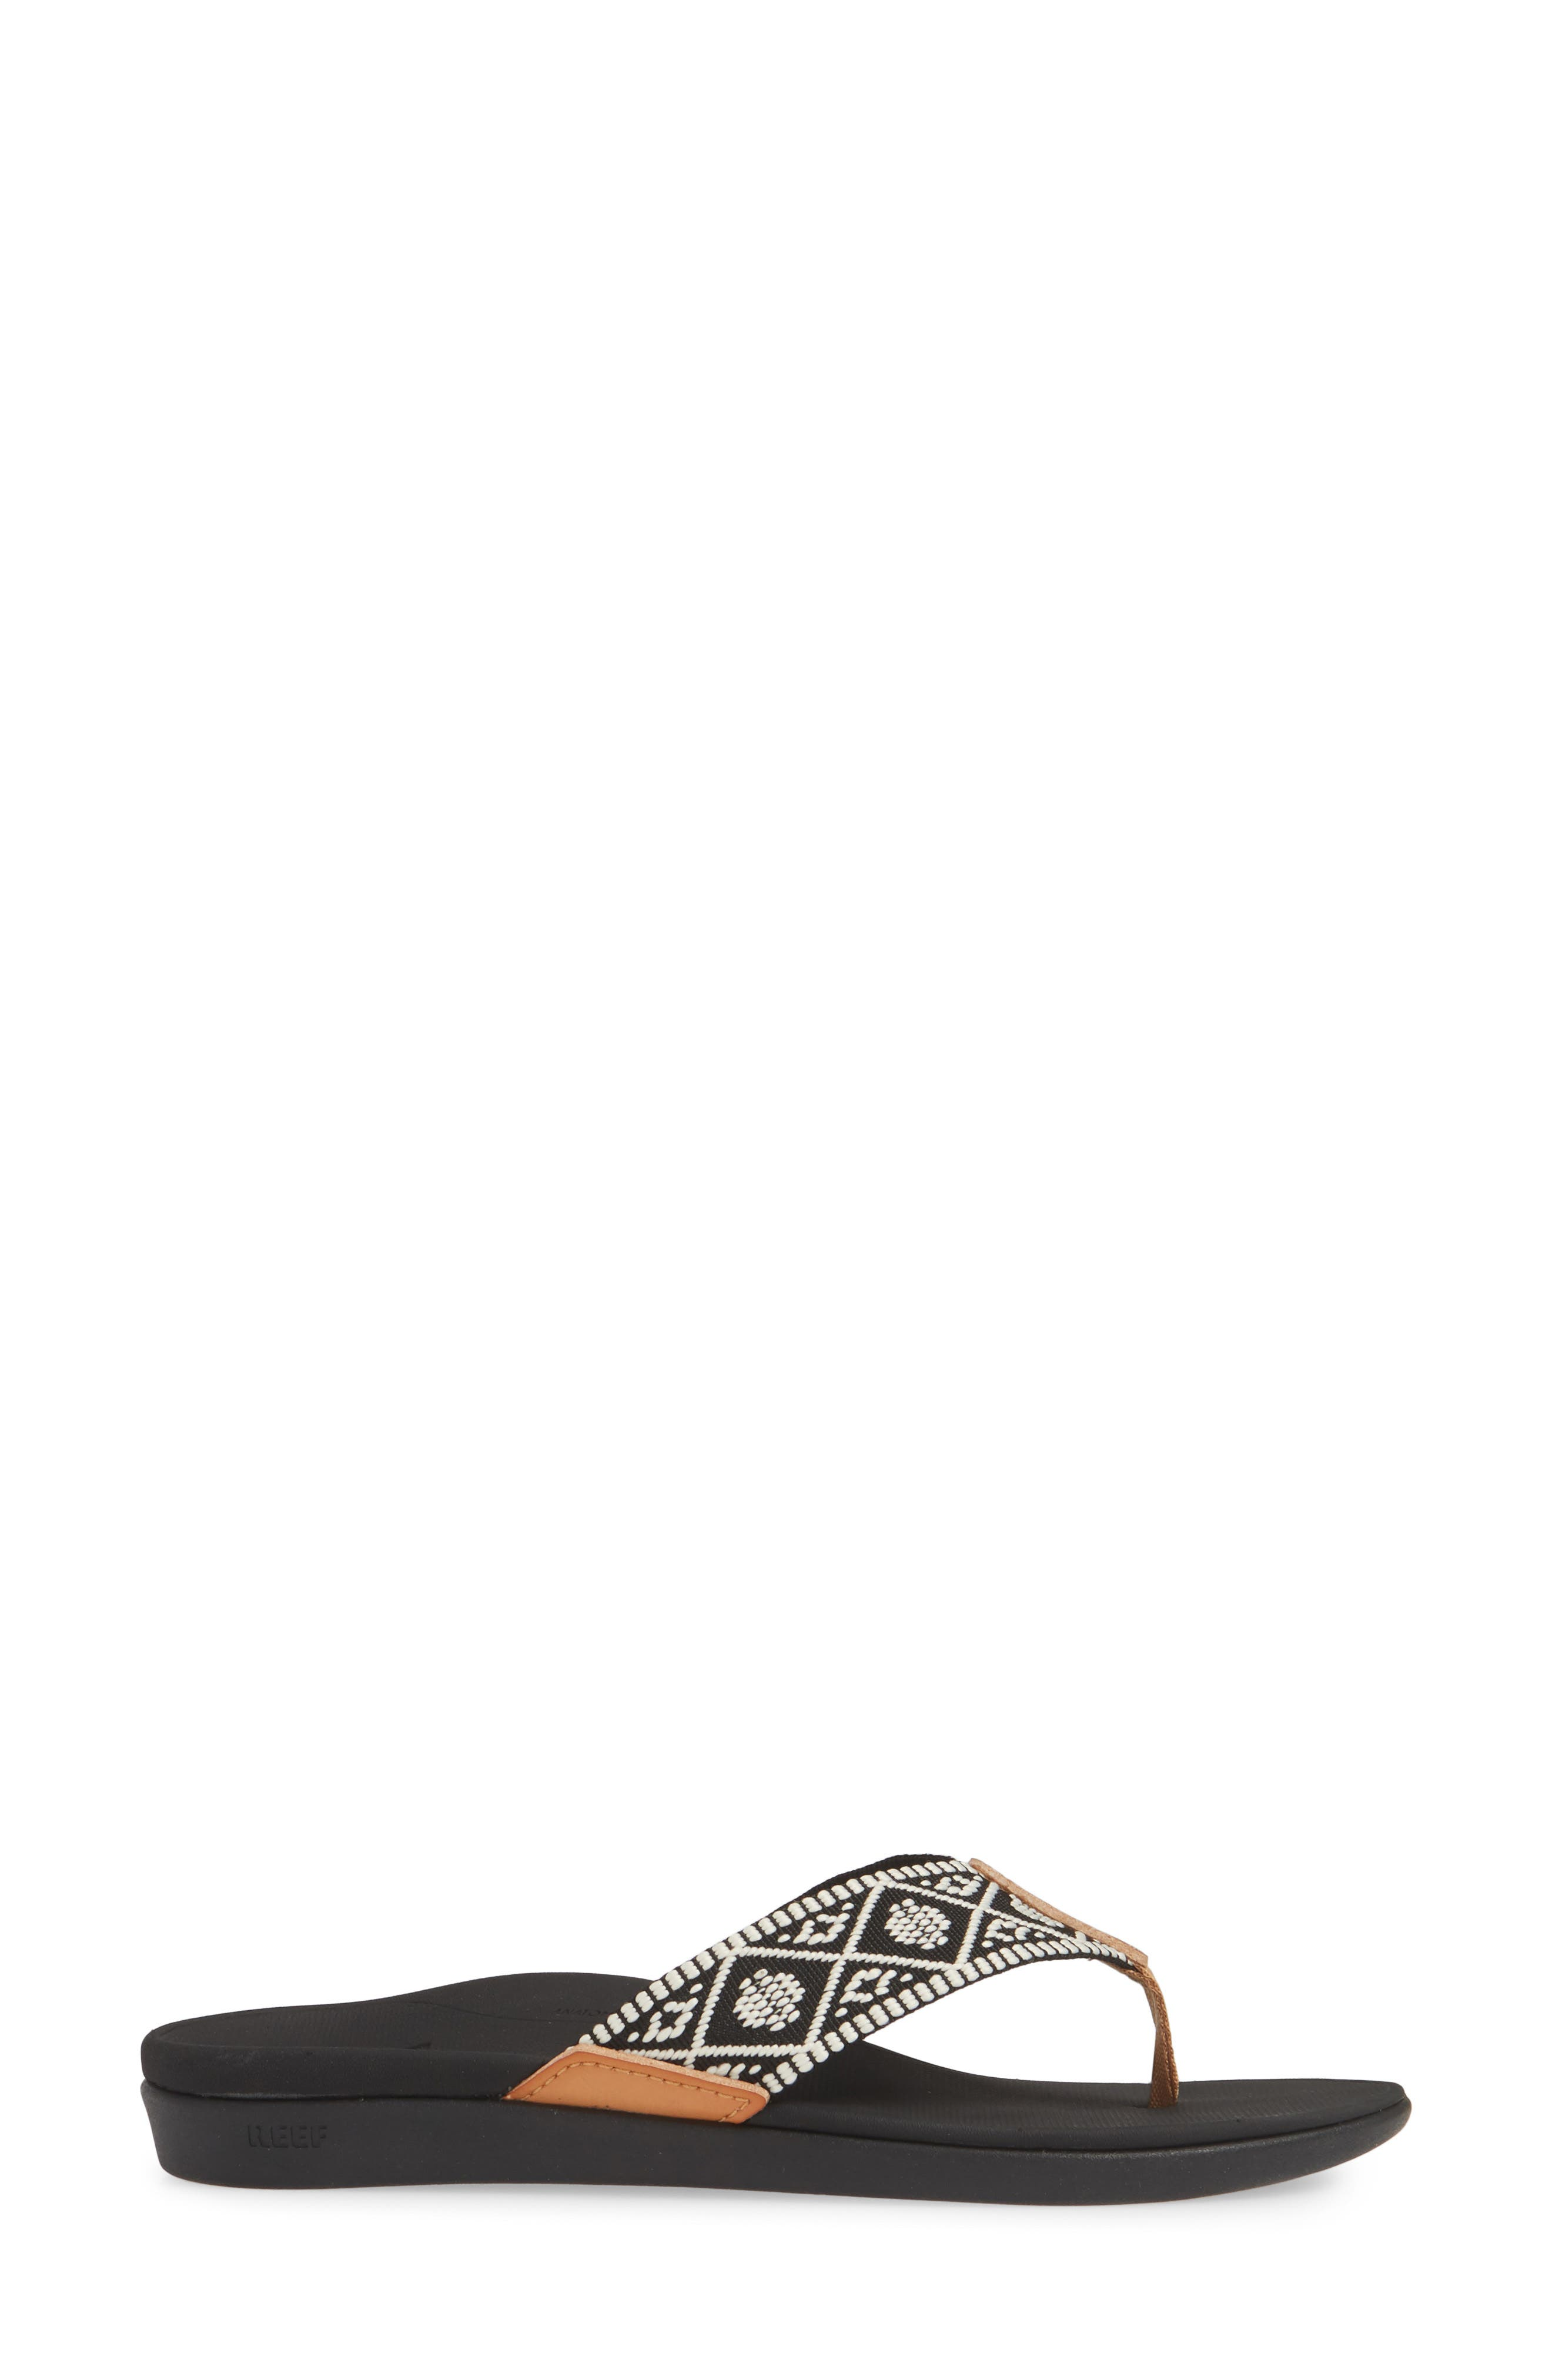 REEF, Ortho-Bounce Woven Flip Flop, Alternate thumbnail 3, color, BLACK/ WHITE